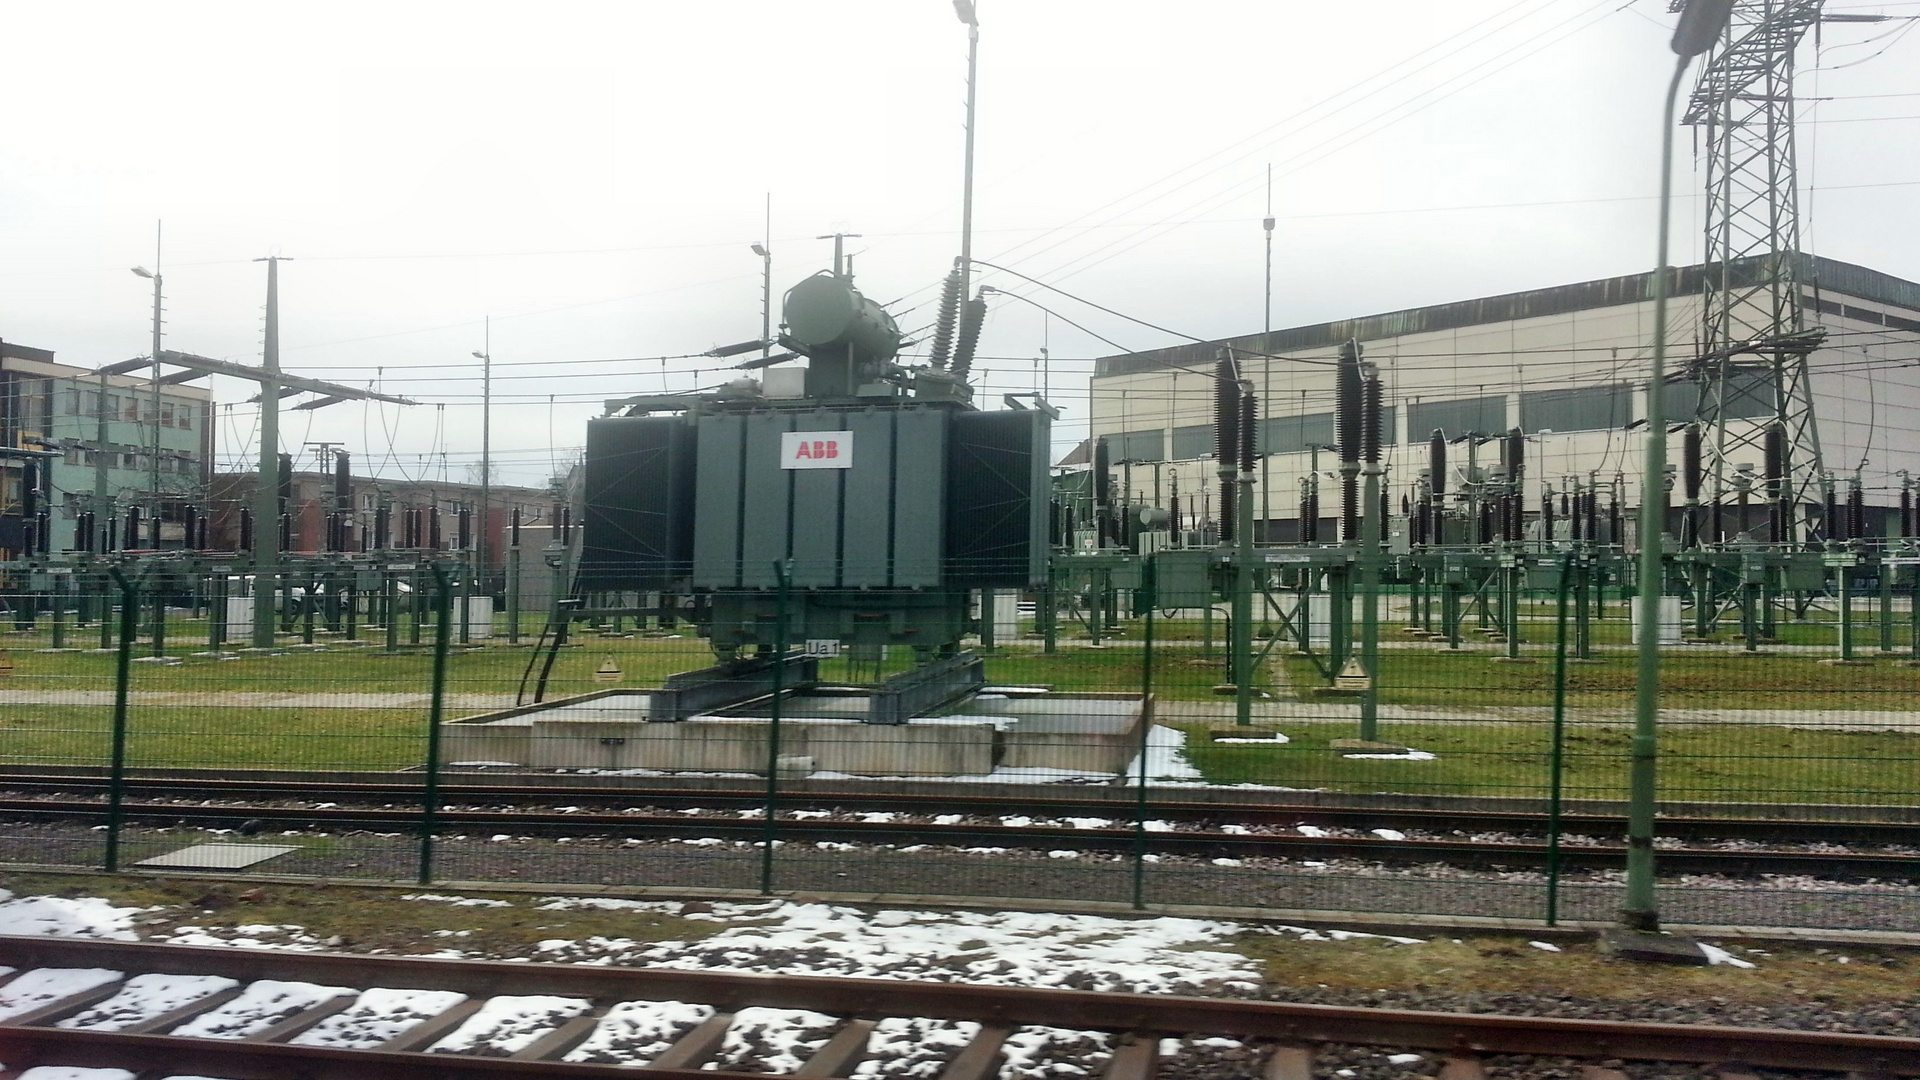 Umspannwerk der DB 110KV / 110.000 Volt